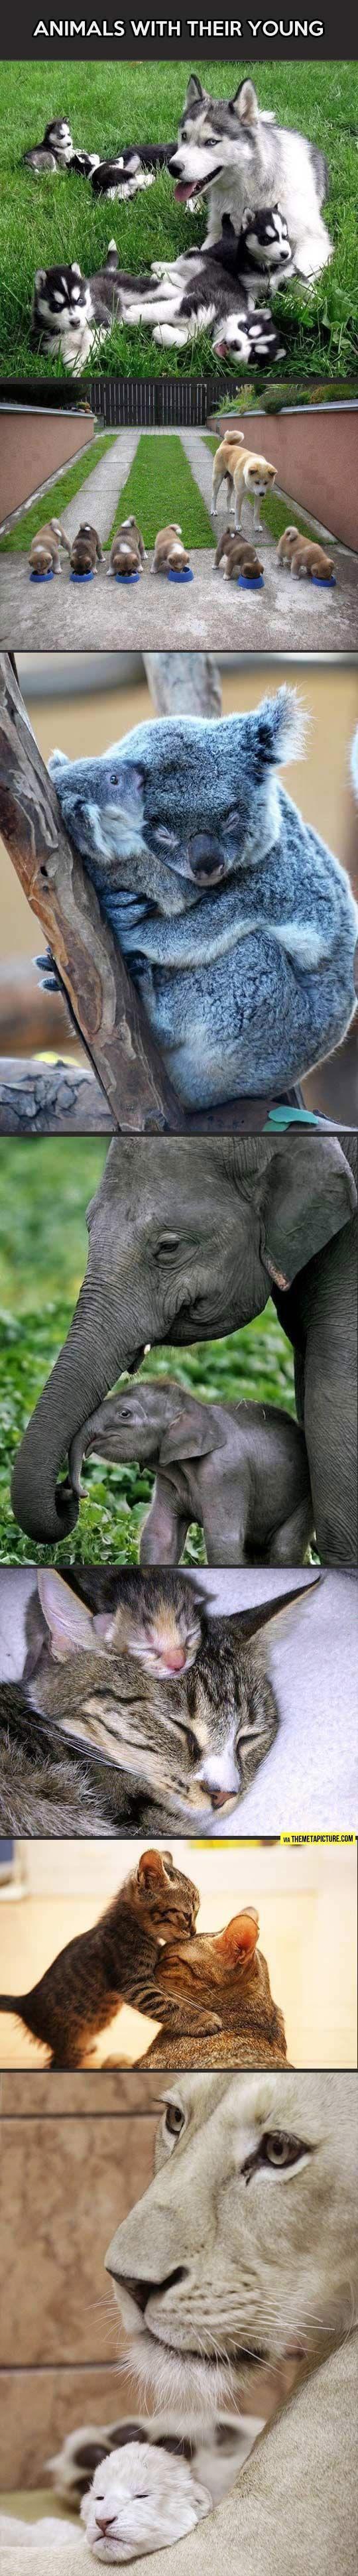 Animals with their babies (scheduled via http://www.tailwindapp.com?utm_source=pinterest&utm_medium=twpin&utm_content=post9914382&utm_campaign=scheduler_attribution)